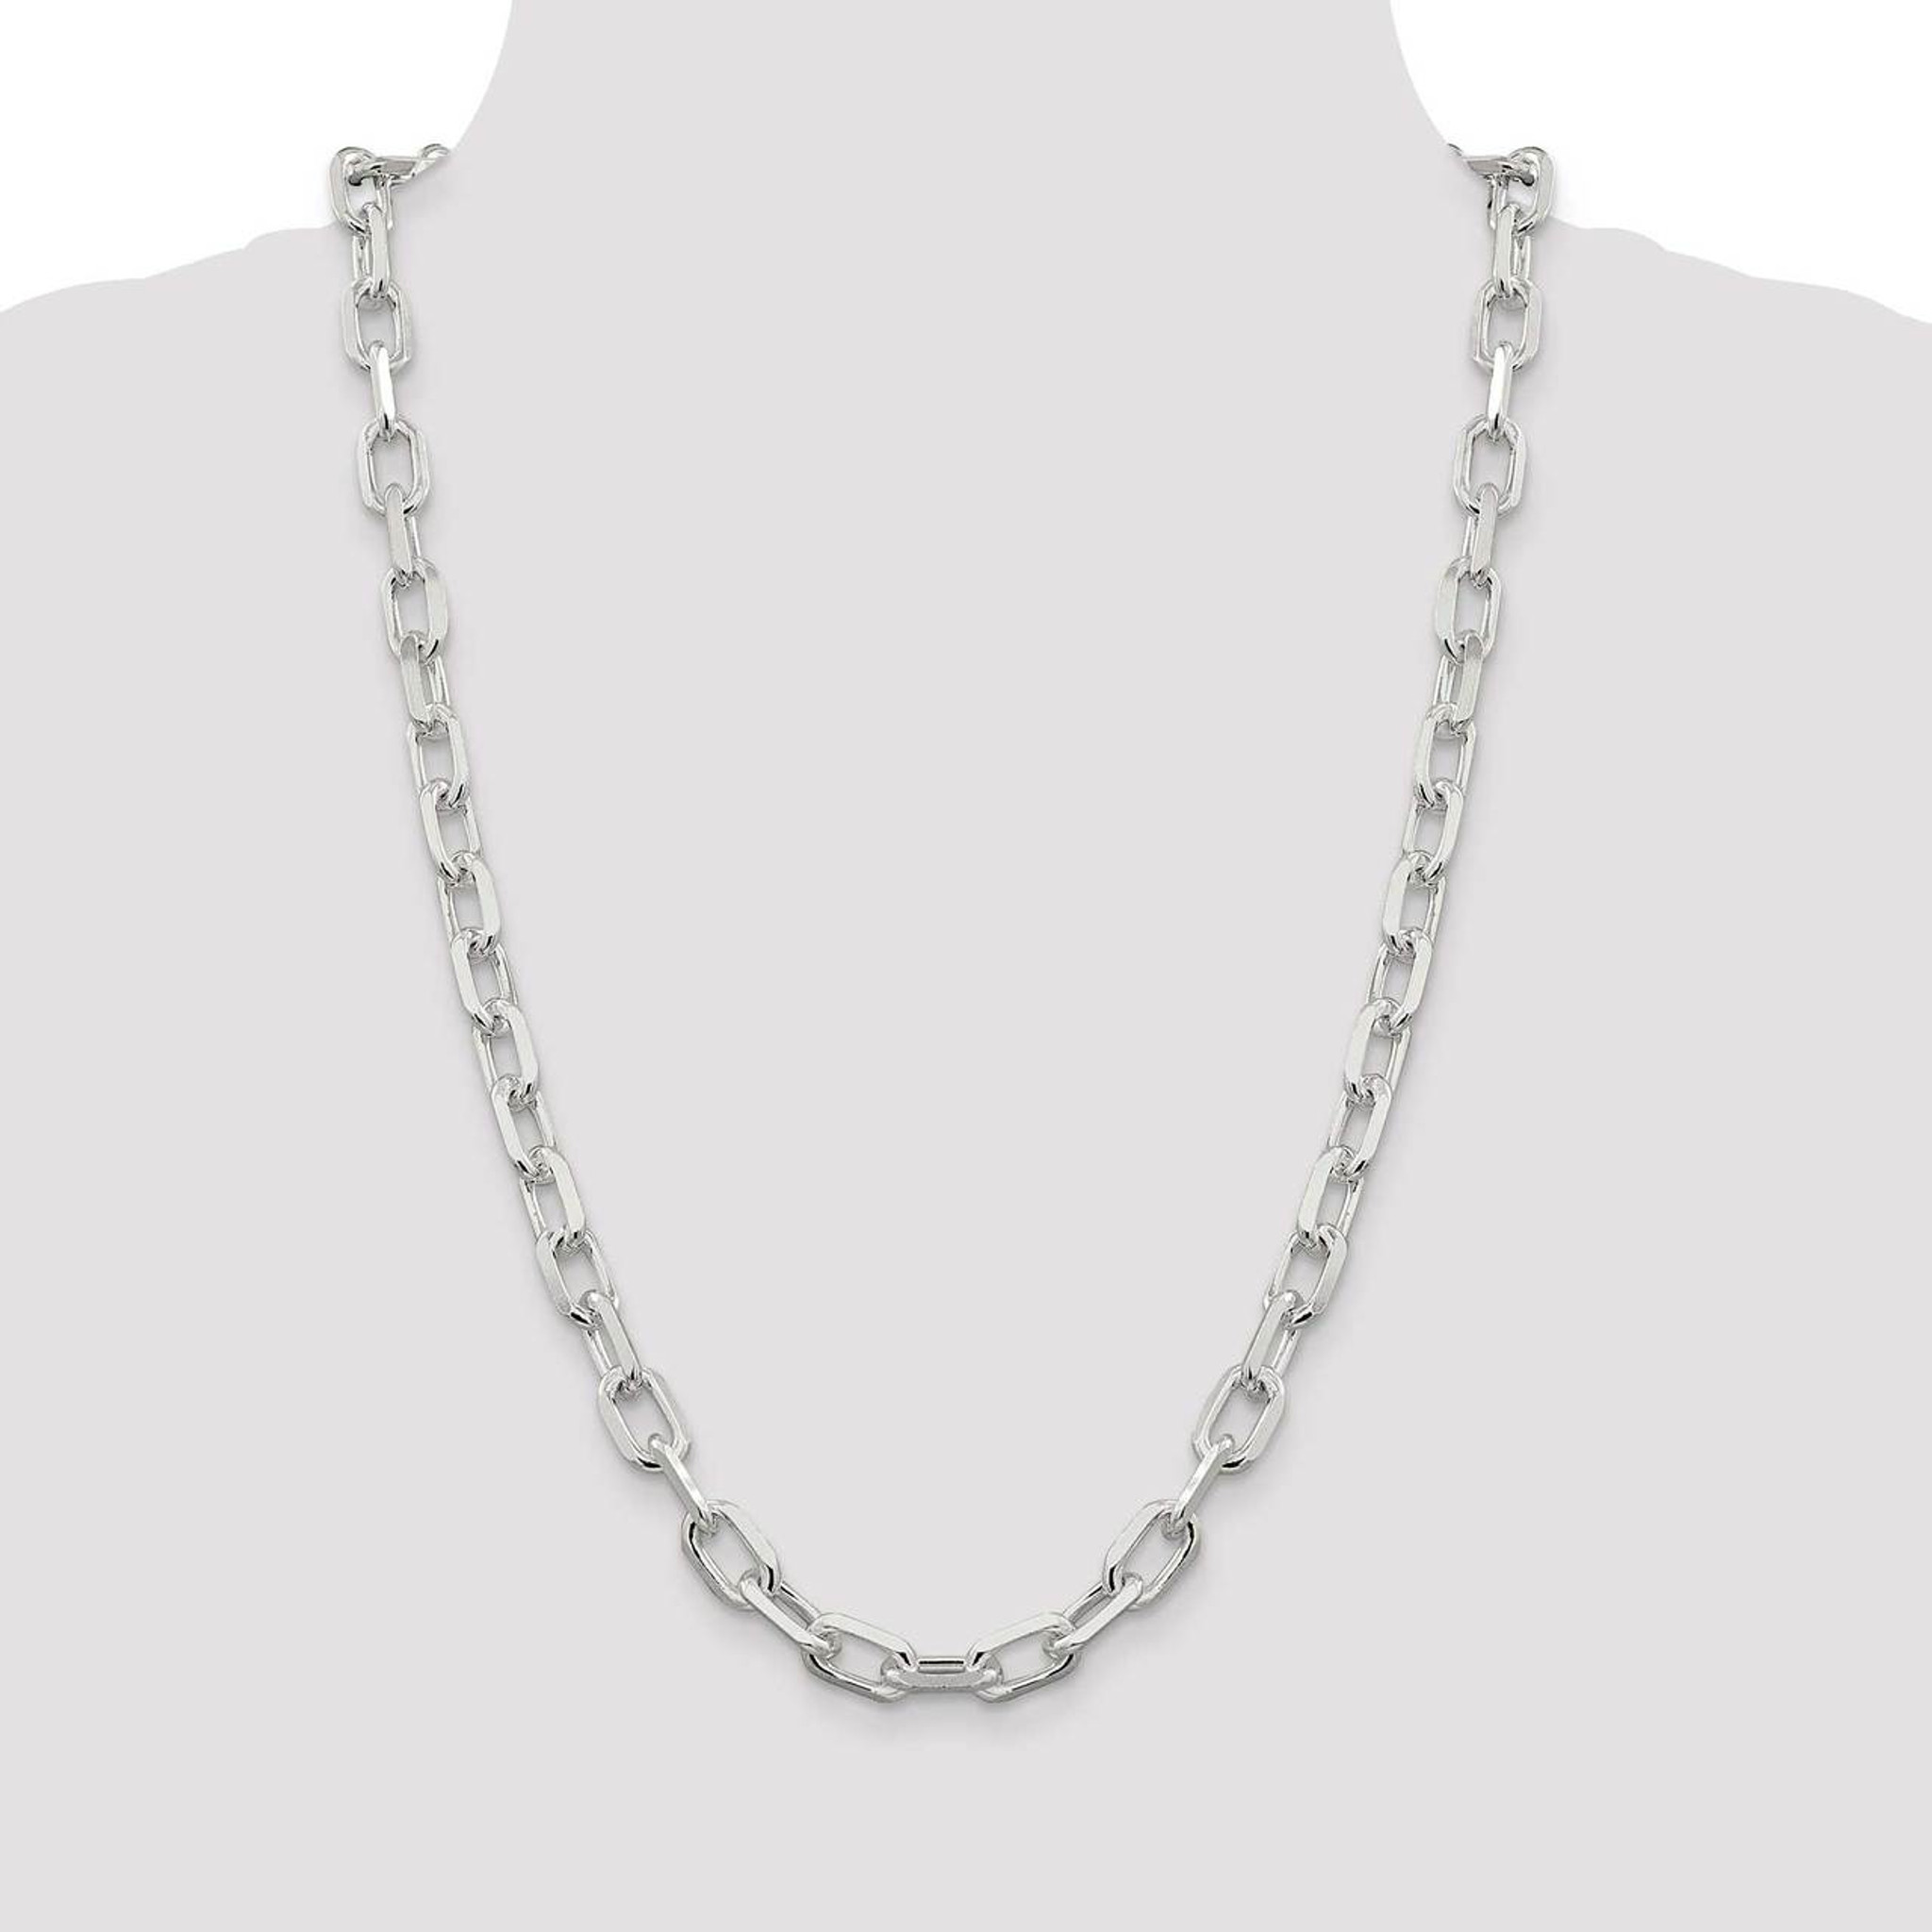 925 Sterling Silver 4.3mm Fancy Diamond-cut Open Link Cable Chain